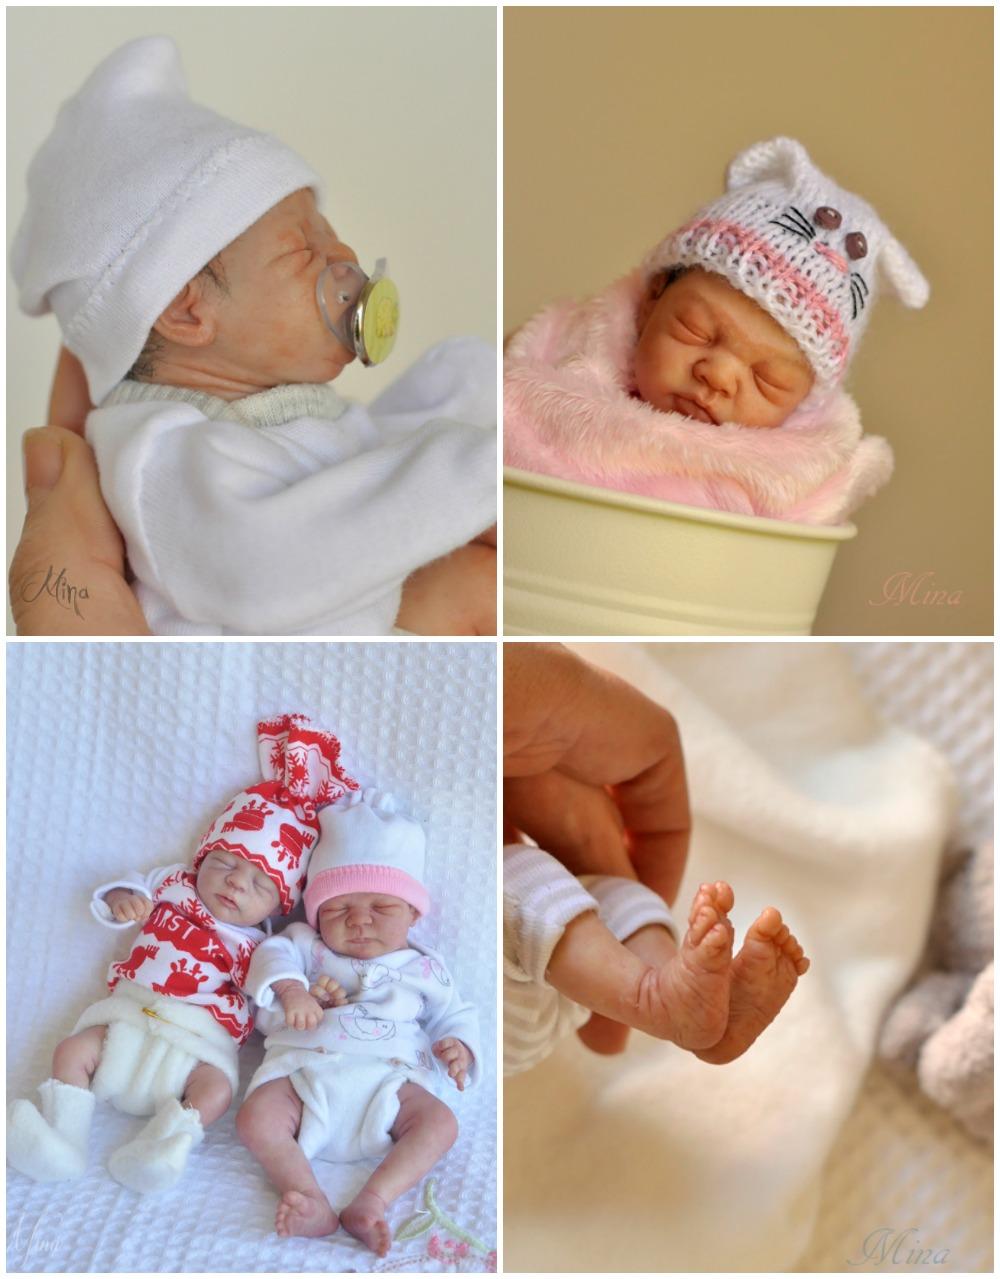 Miniture clay baby sculptures